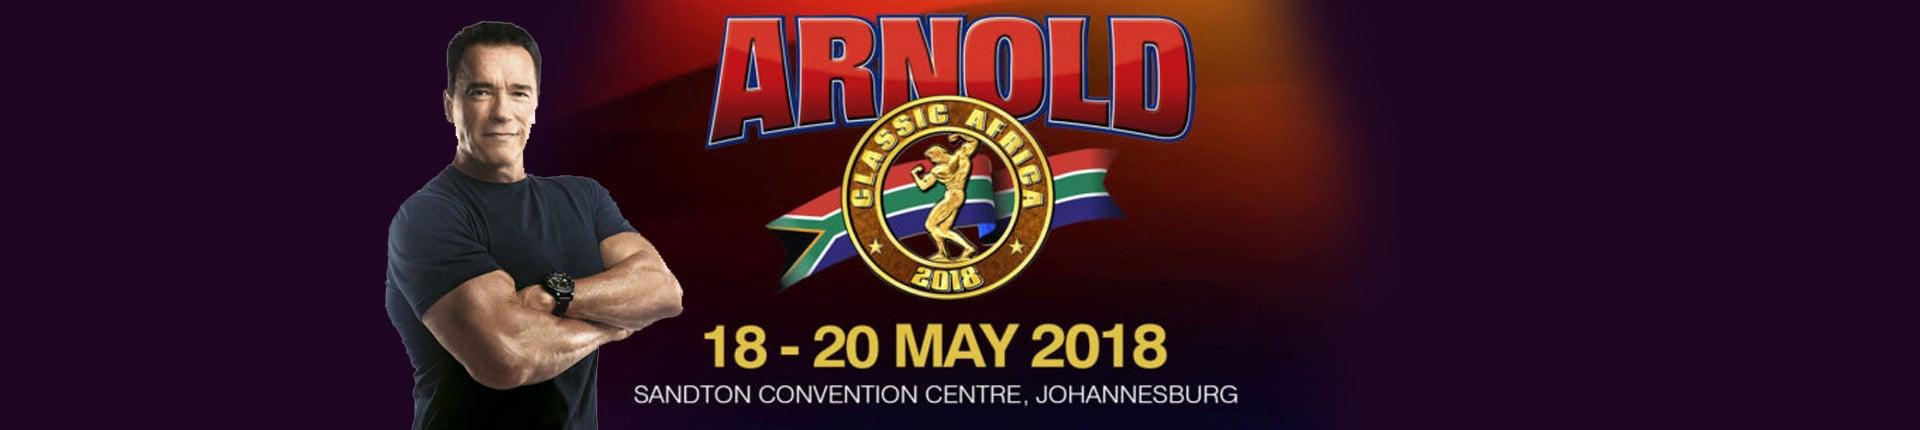 Arnold Classic Africa - Johannesburg 2018